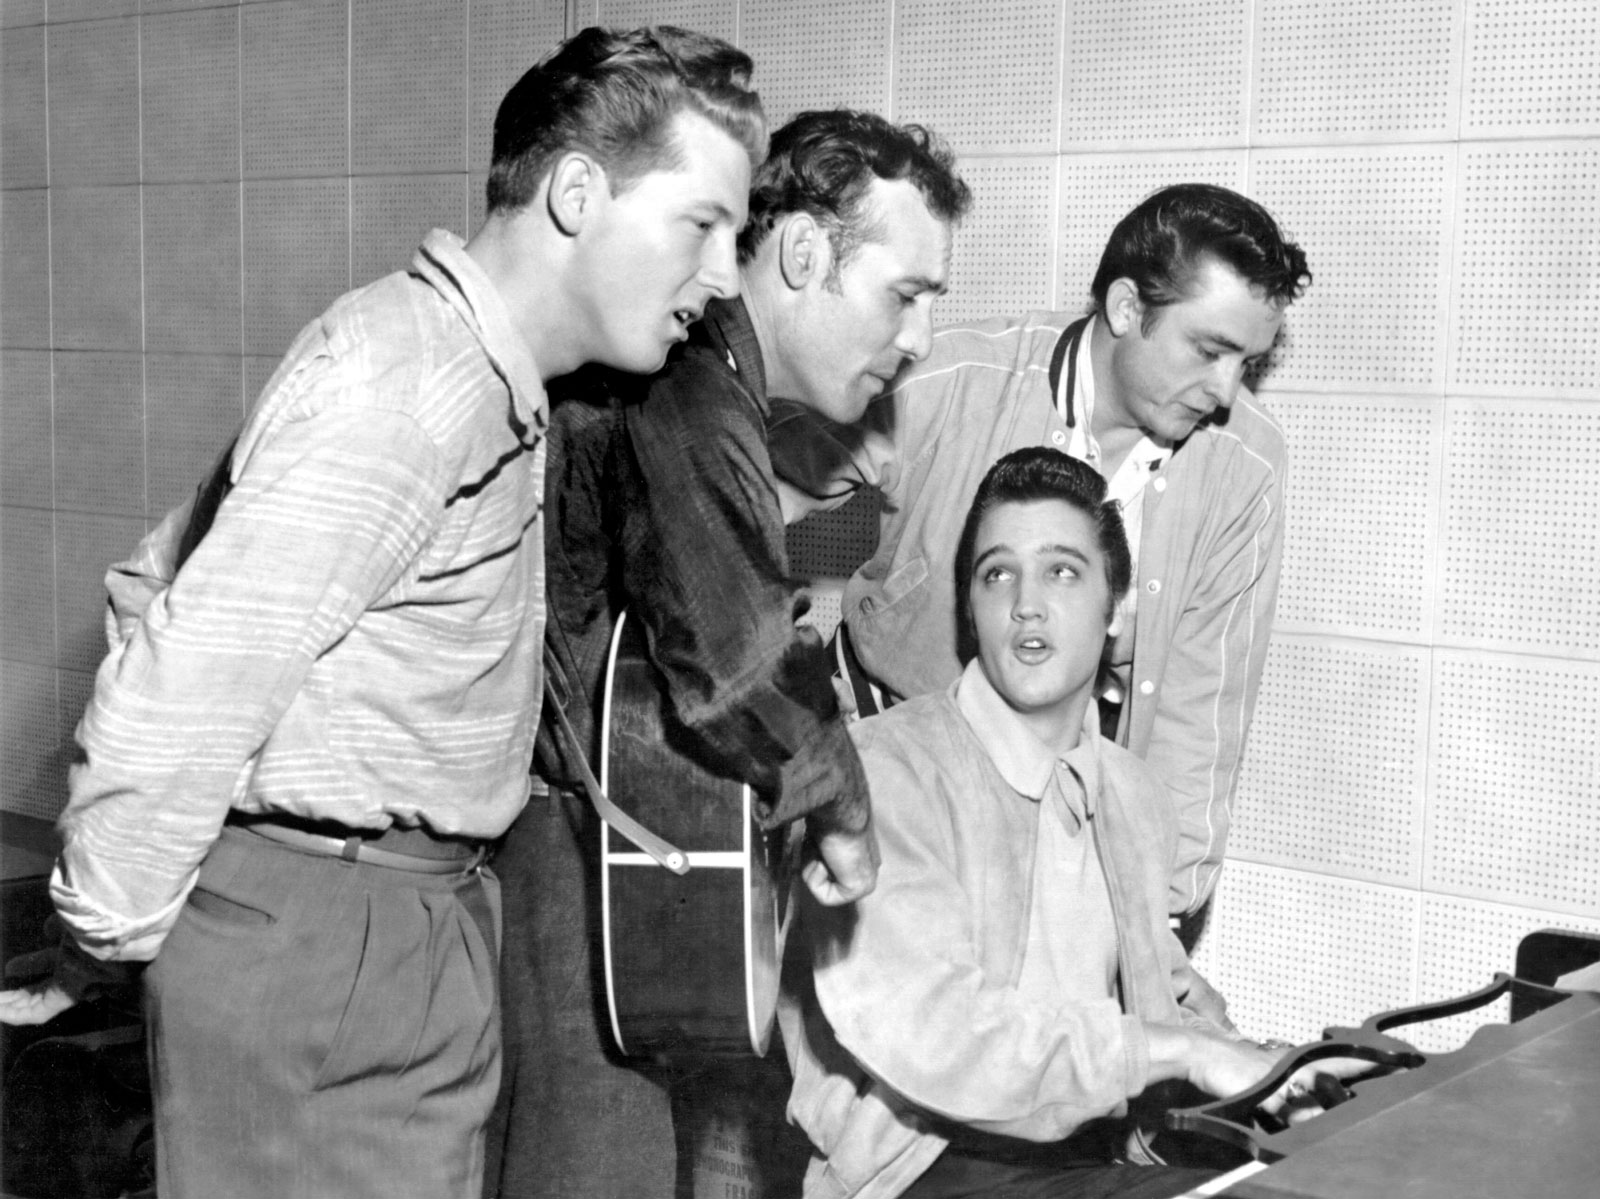 The Million Dollar Quartet at Sun Studios on December 4, 1956.